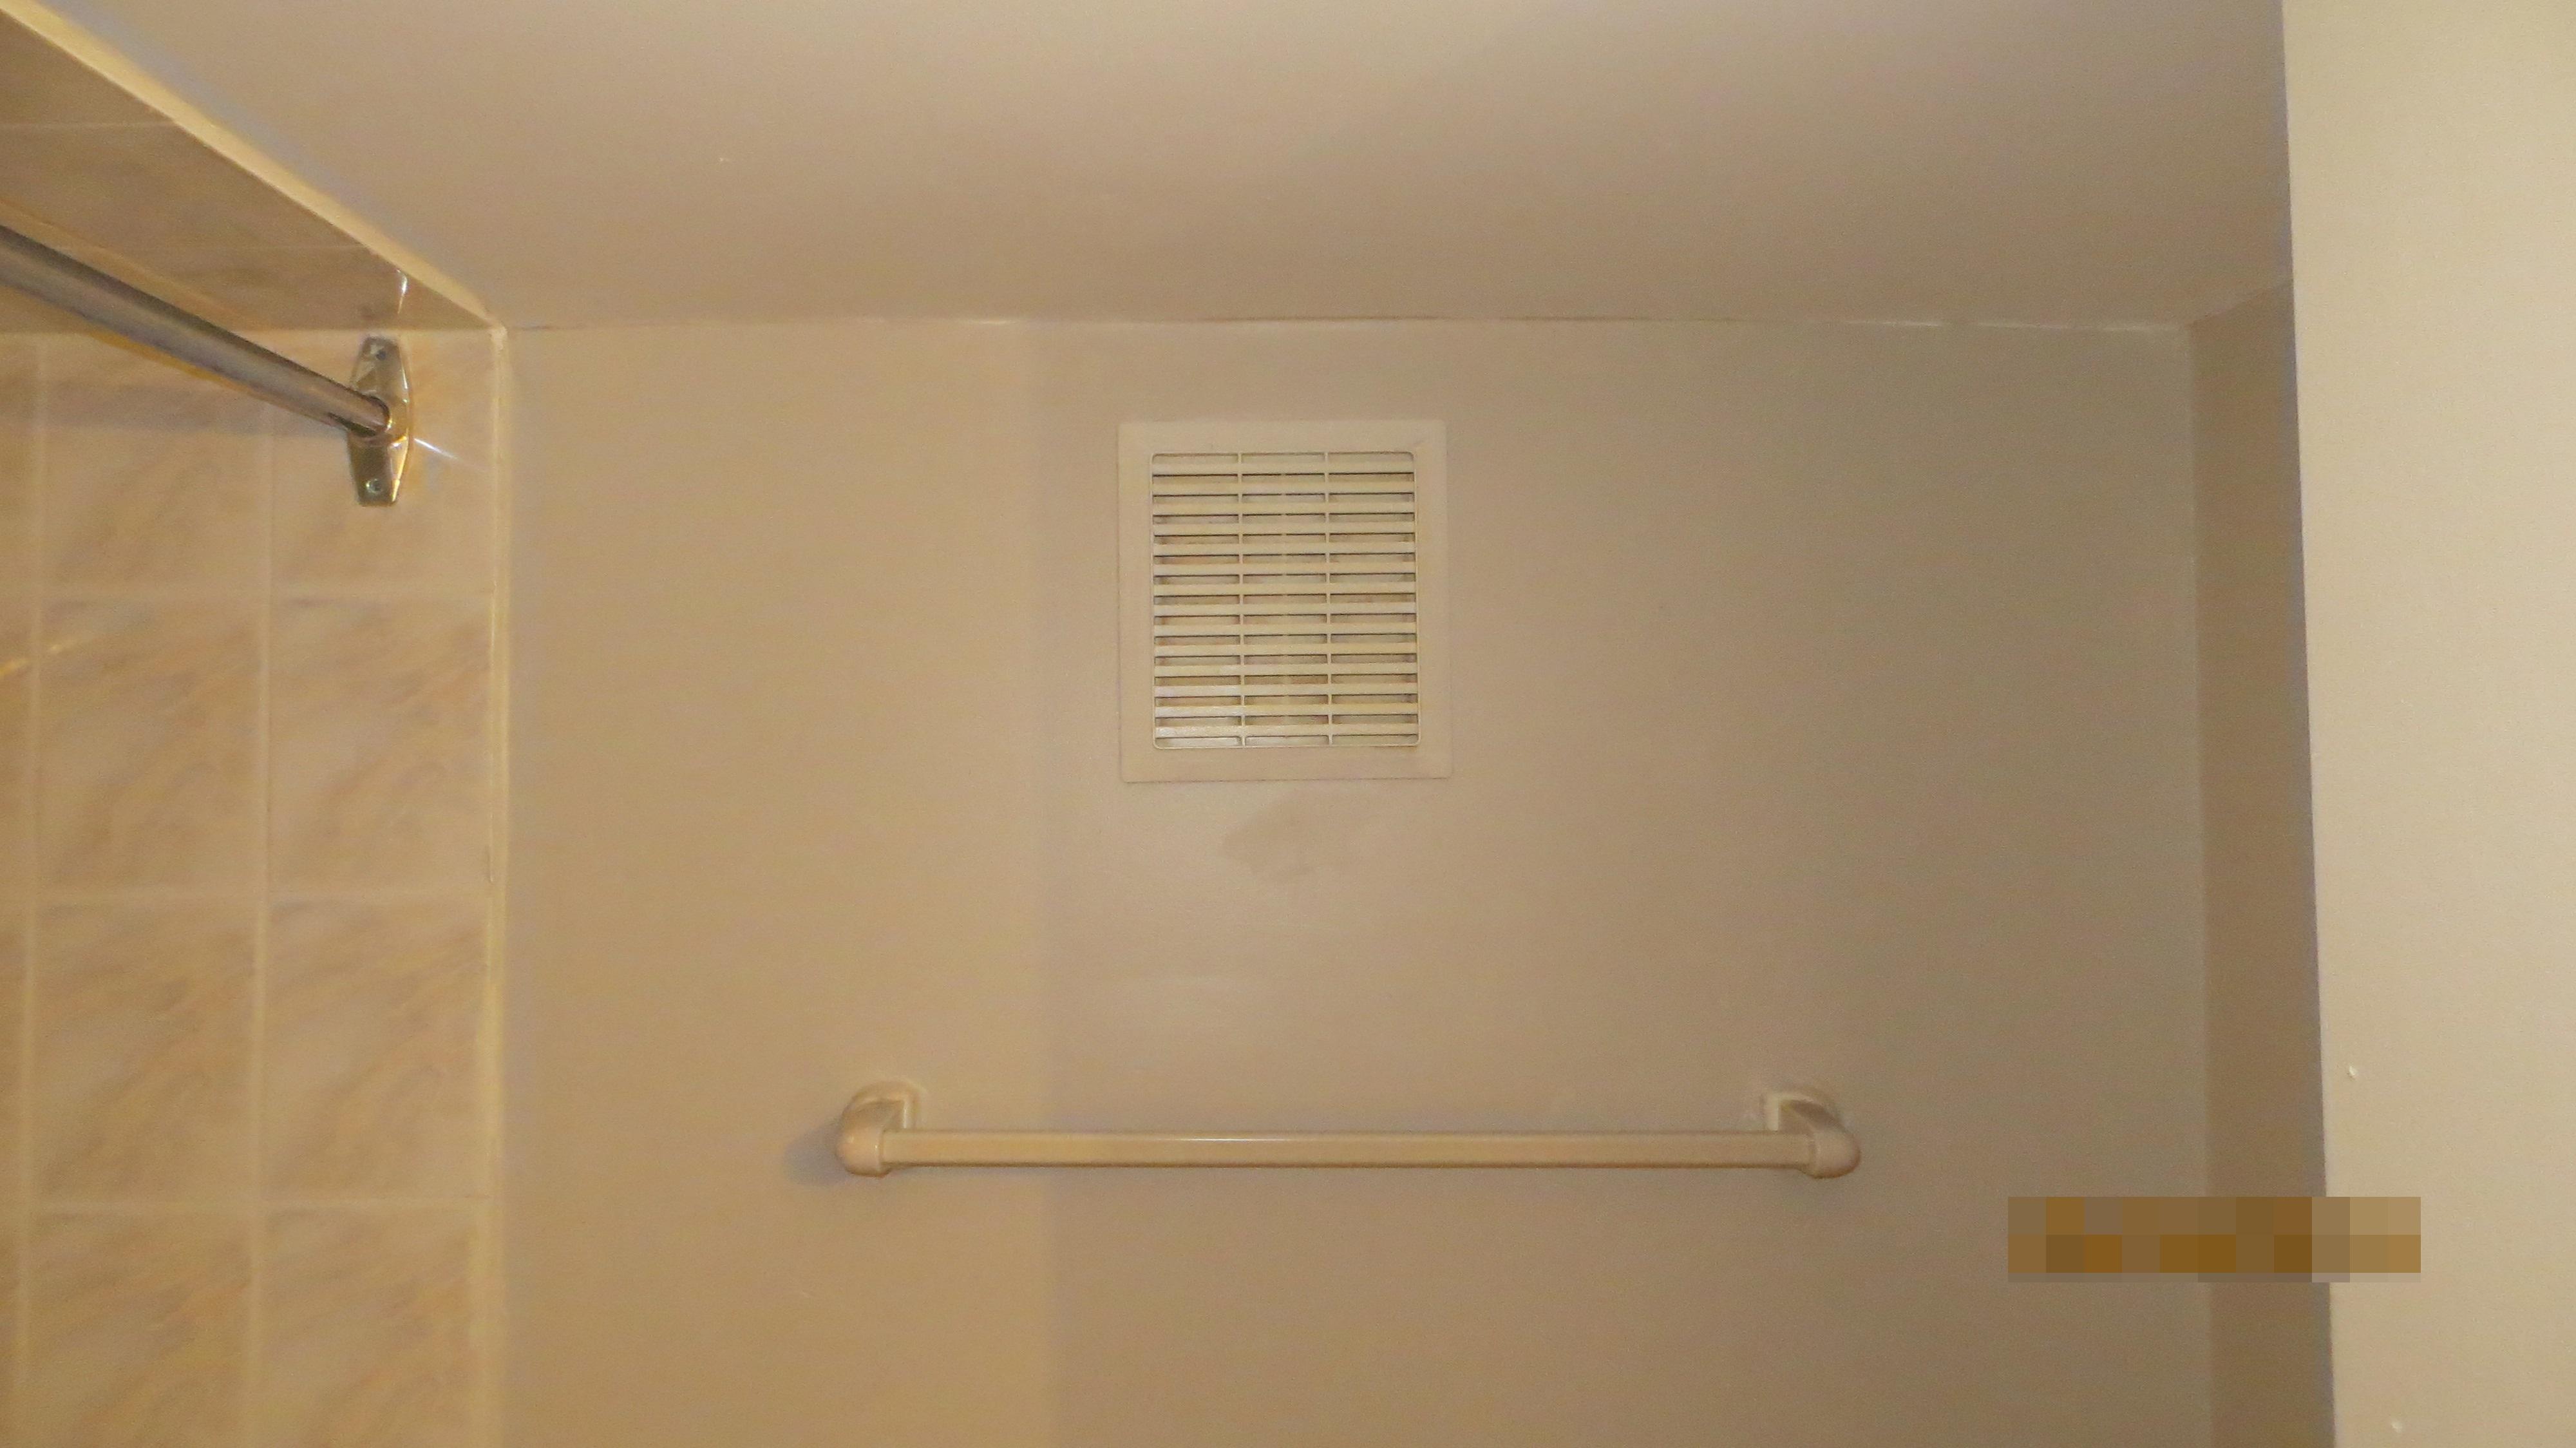 Washroom exhaust fan…..